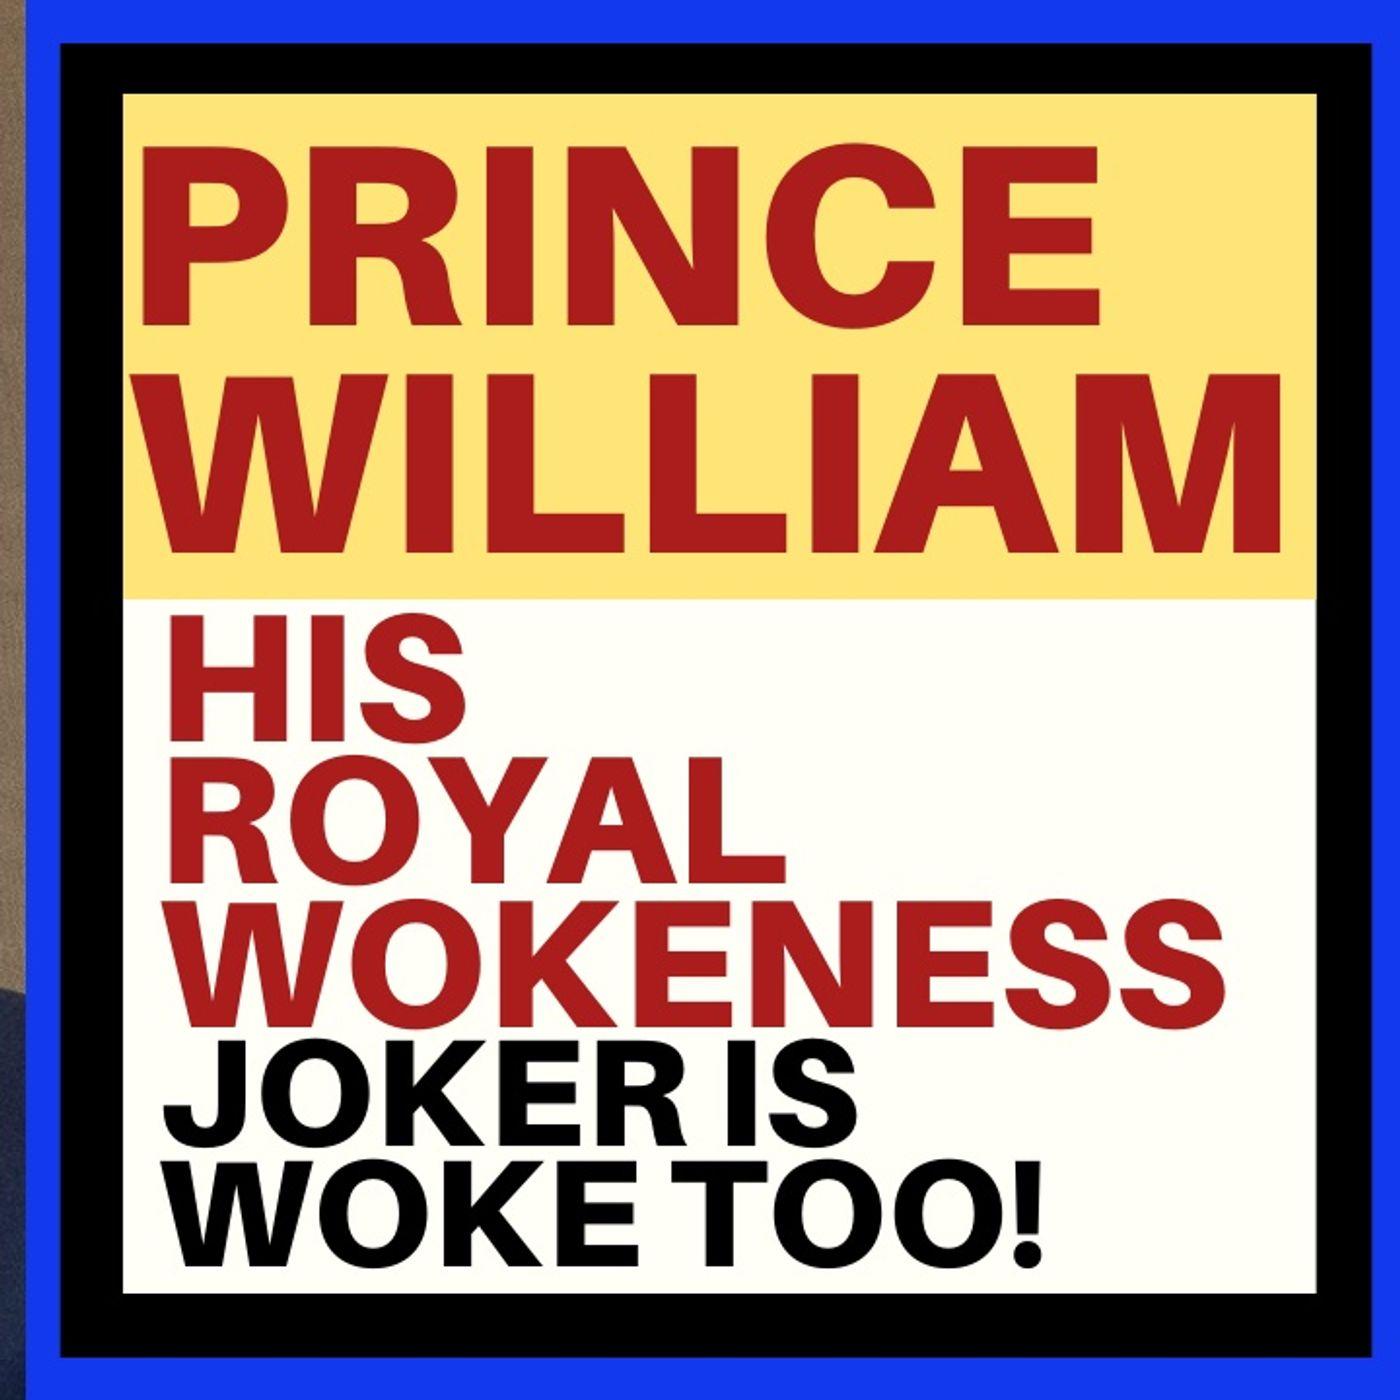 WOKE INDEED!  PRINCE WILLIAM AND JOAQUIN PHOENIX GROVEL AT BAFTA AWARDS